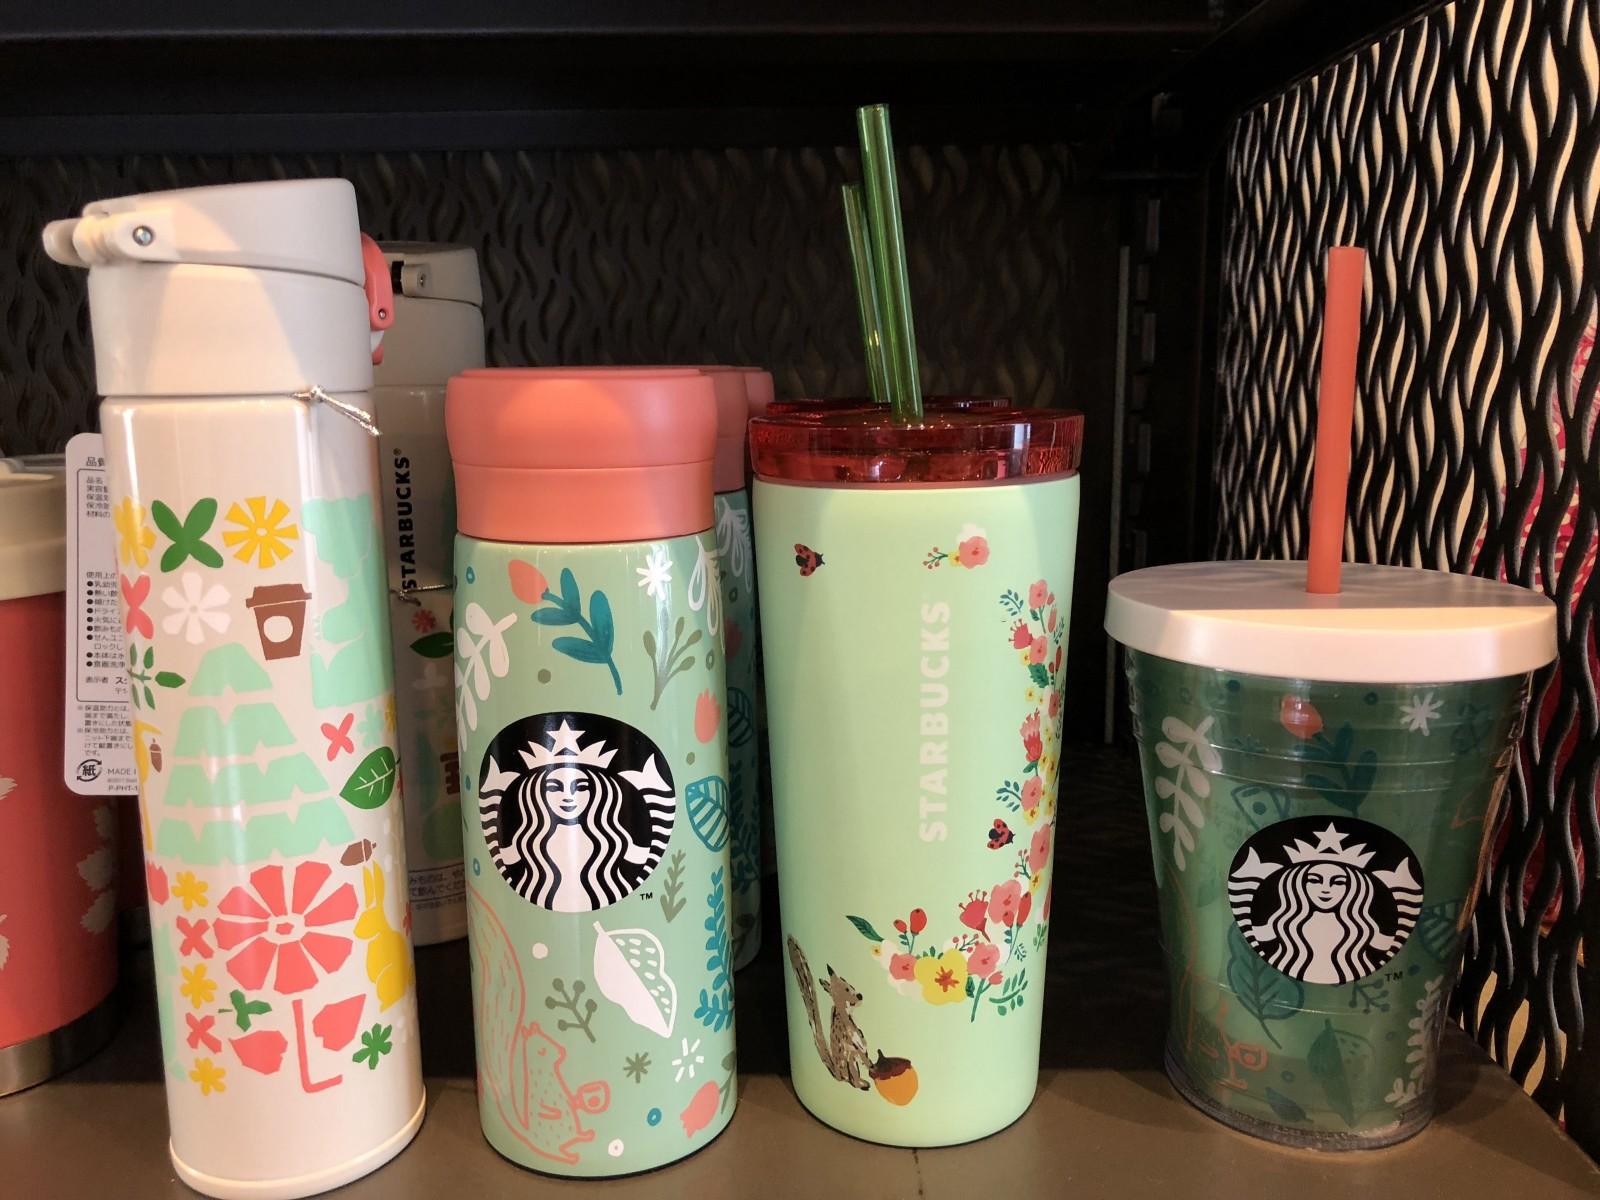 Starbucks Japan S Tumblers And Drinks 2018 Japan Web Magazine